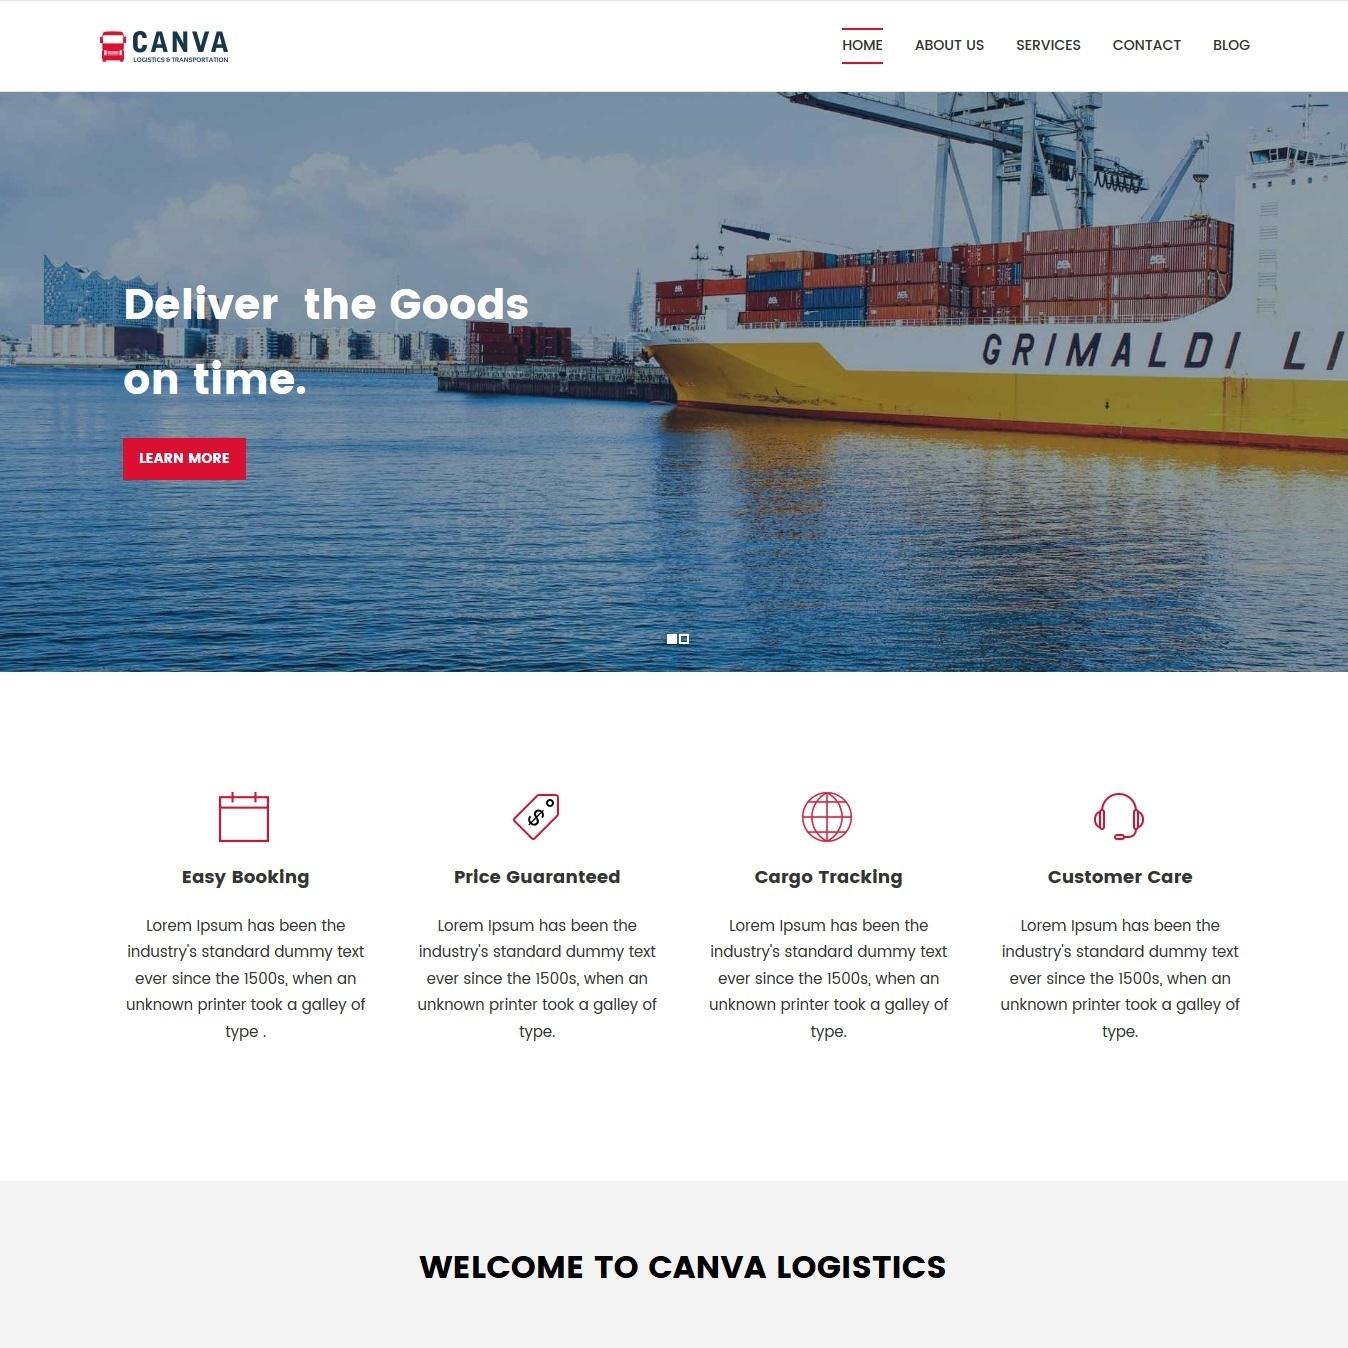 web-preprava-logistika-nahled